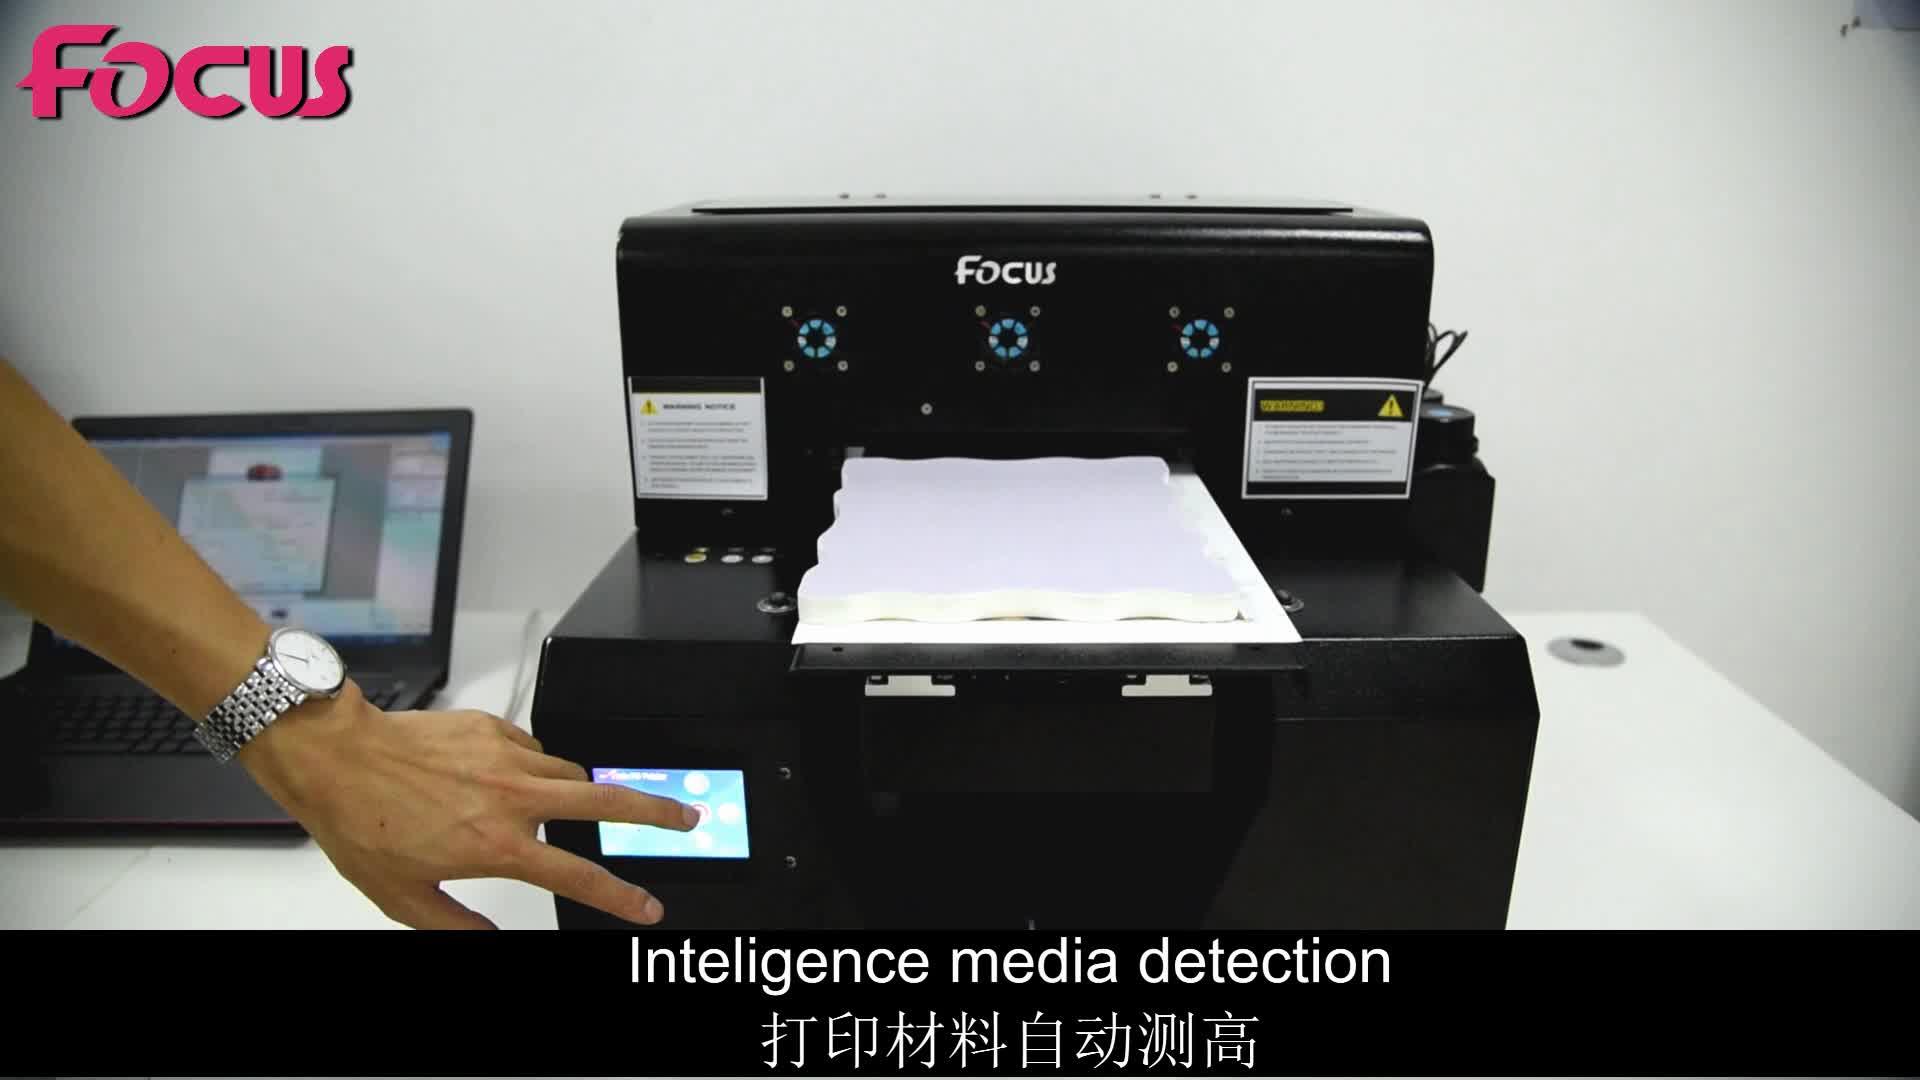 Sapphire jet x mini custom digital flatbed led uv small eco solvent printer 3d small label